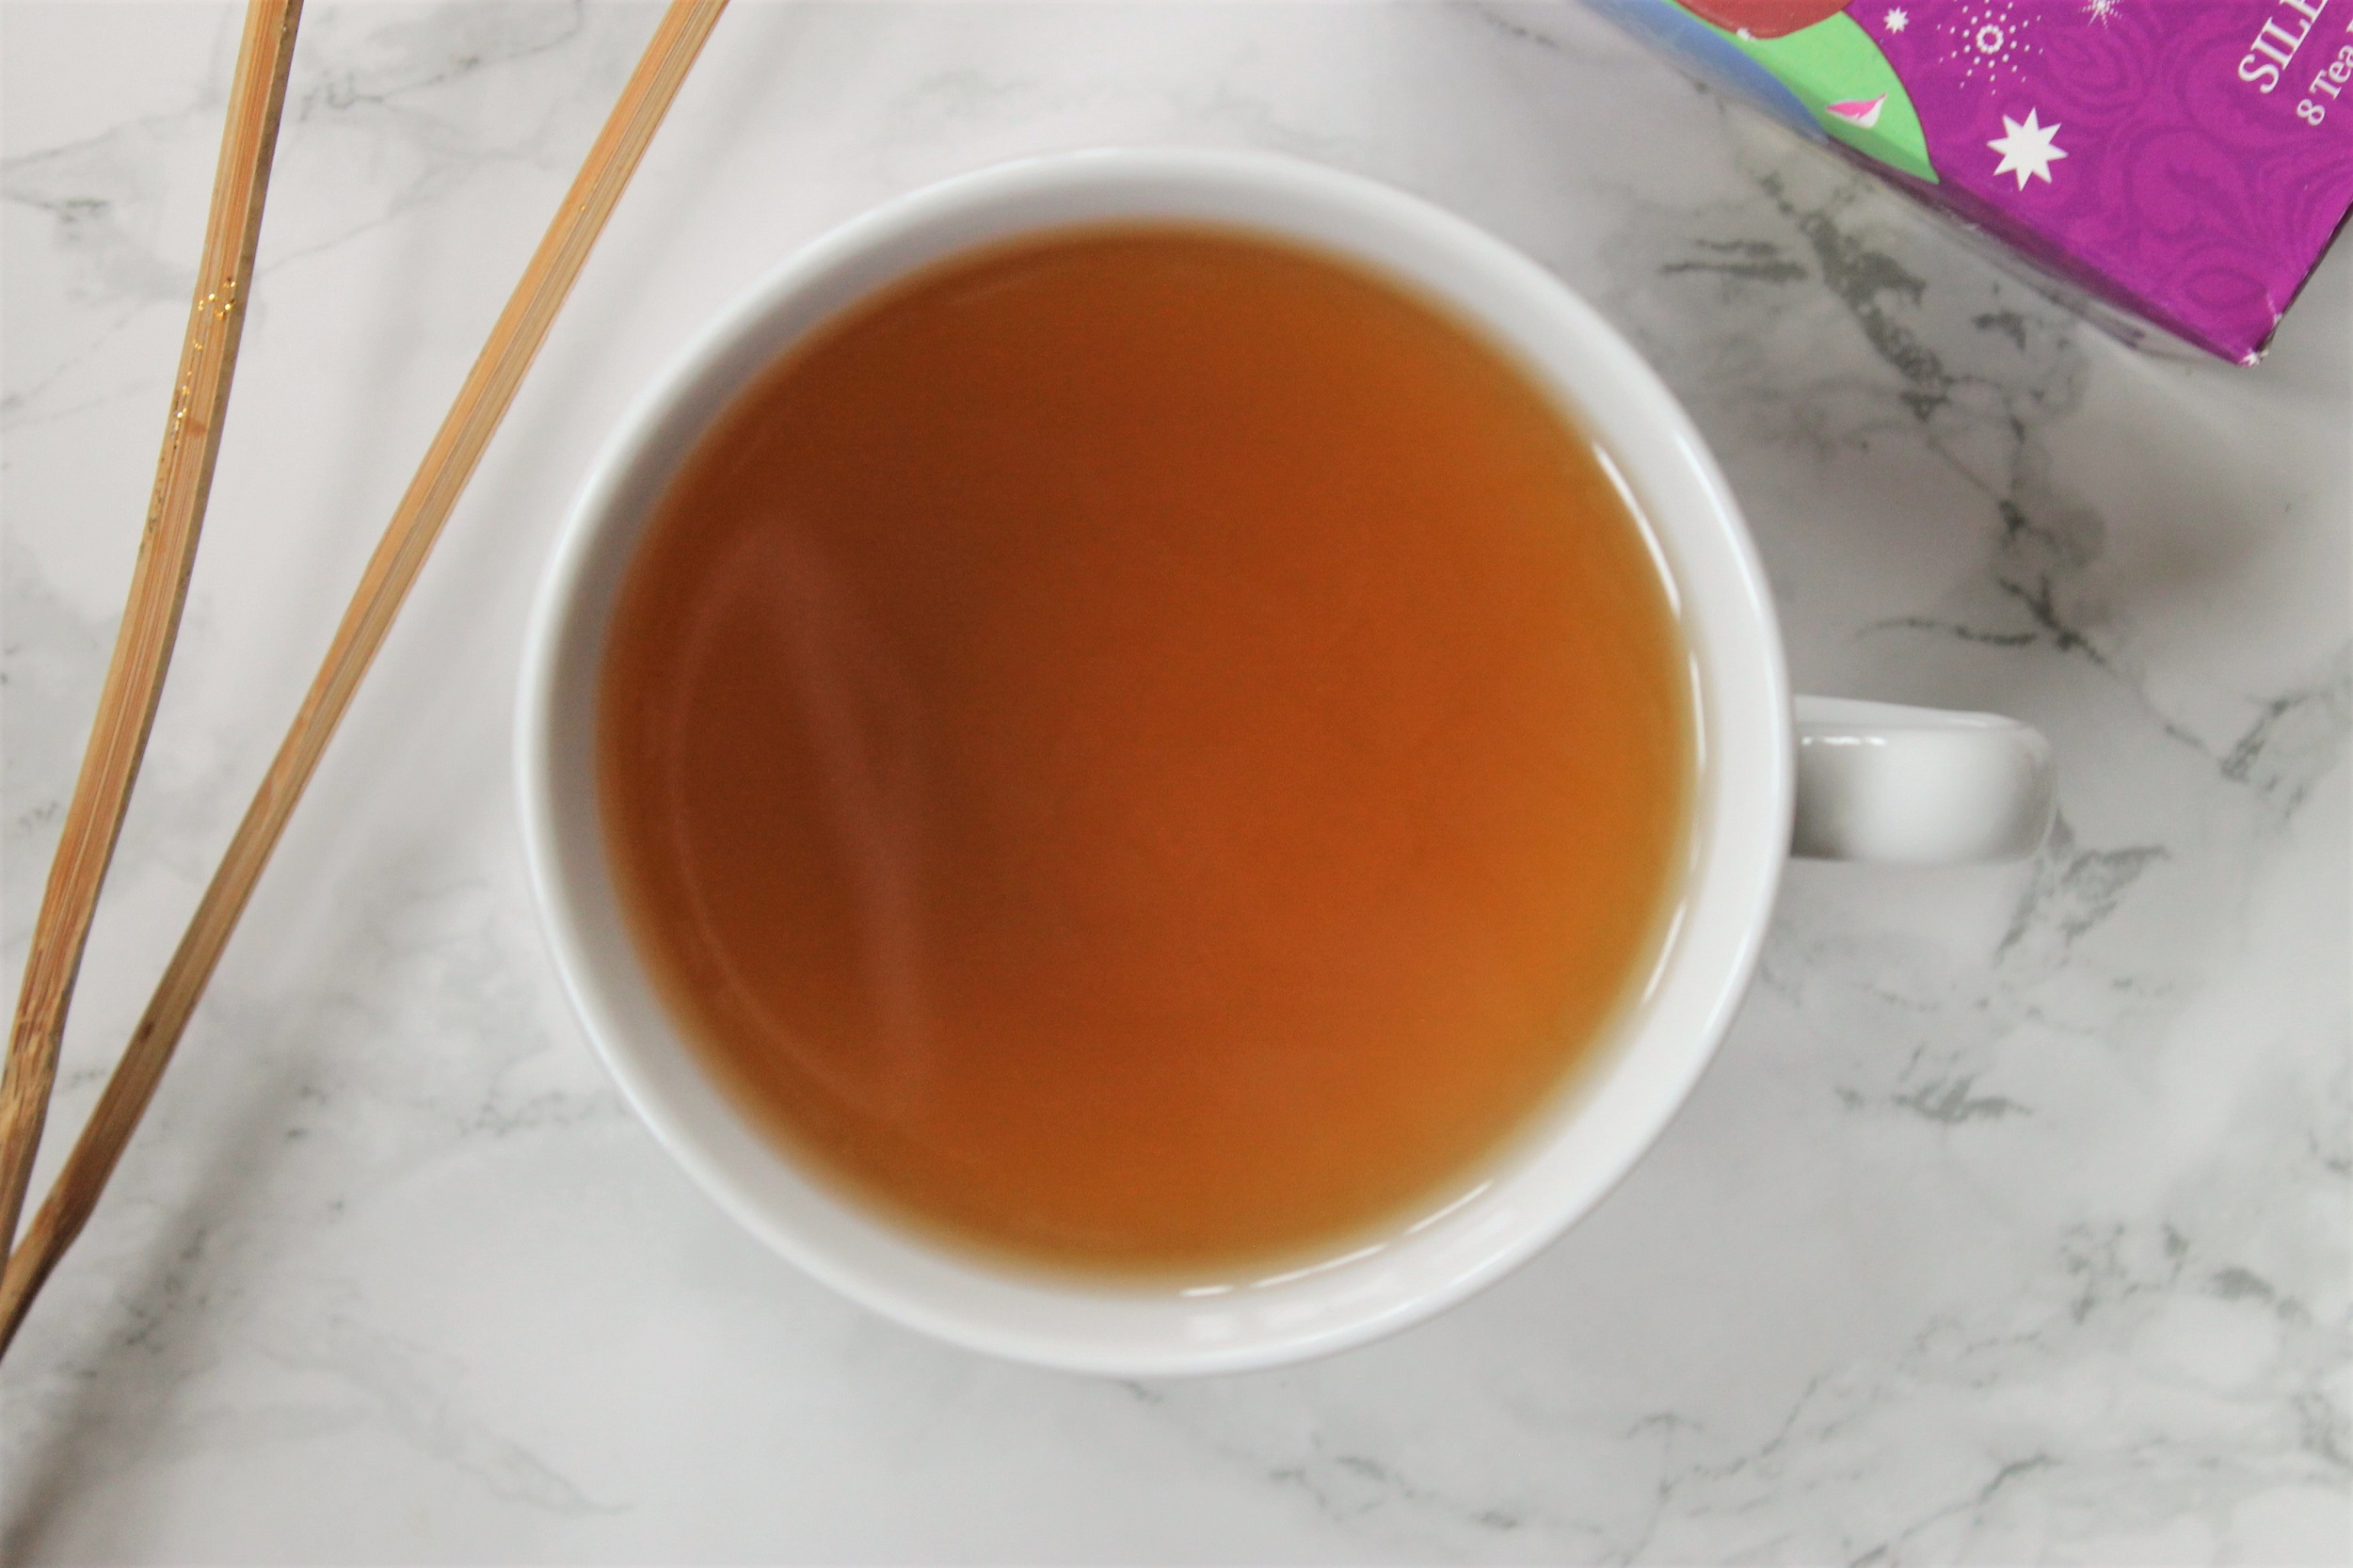 silent night tea in white porcelain teacup